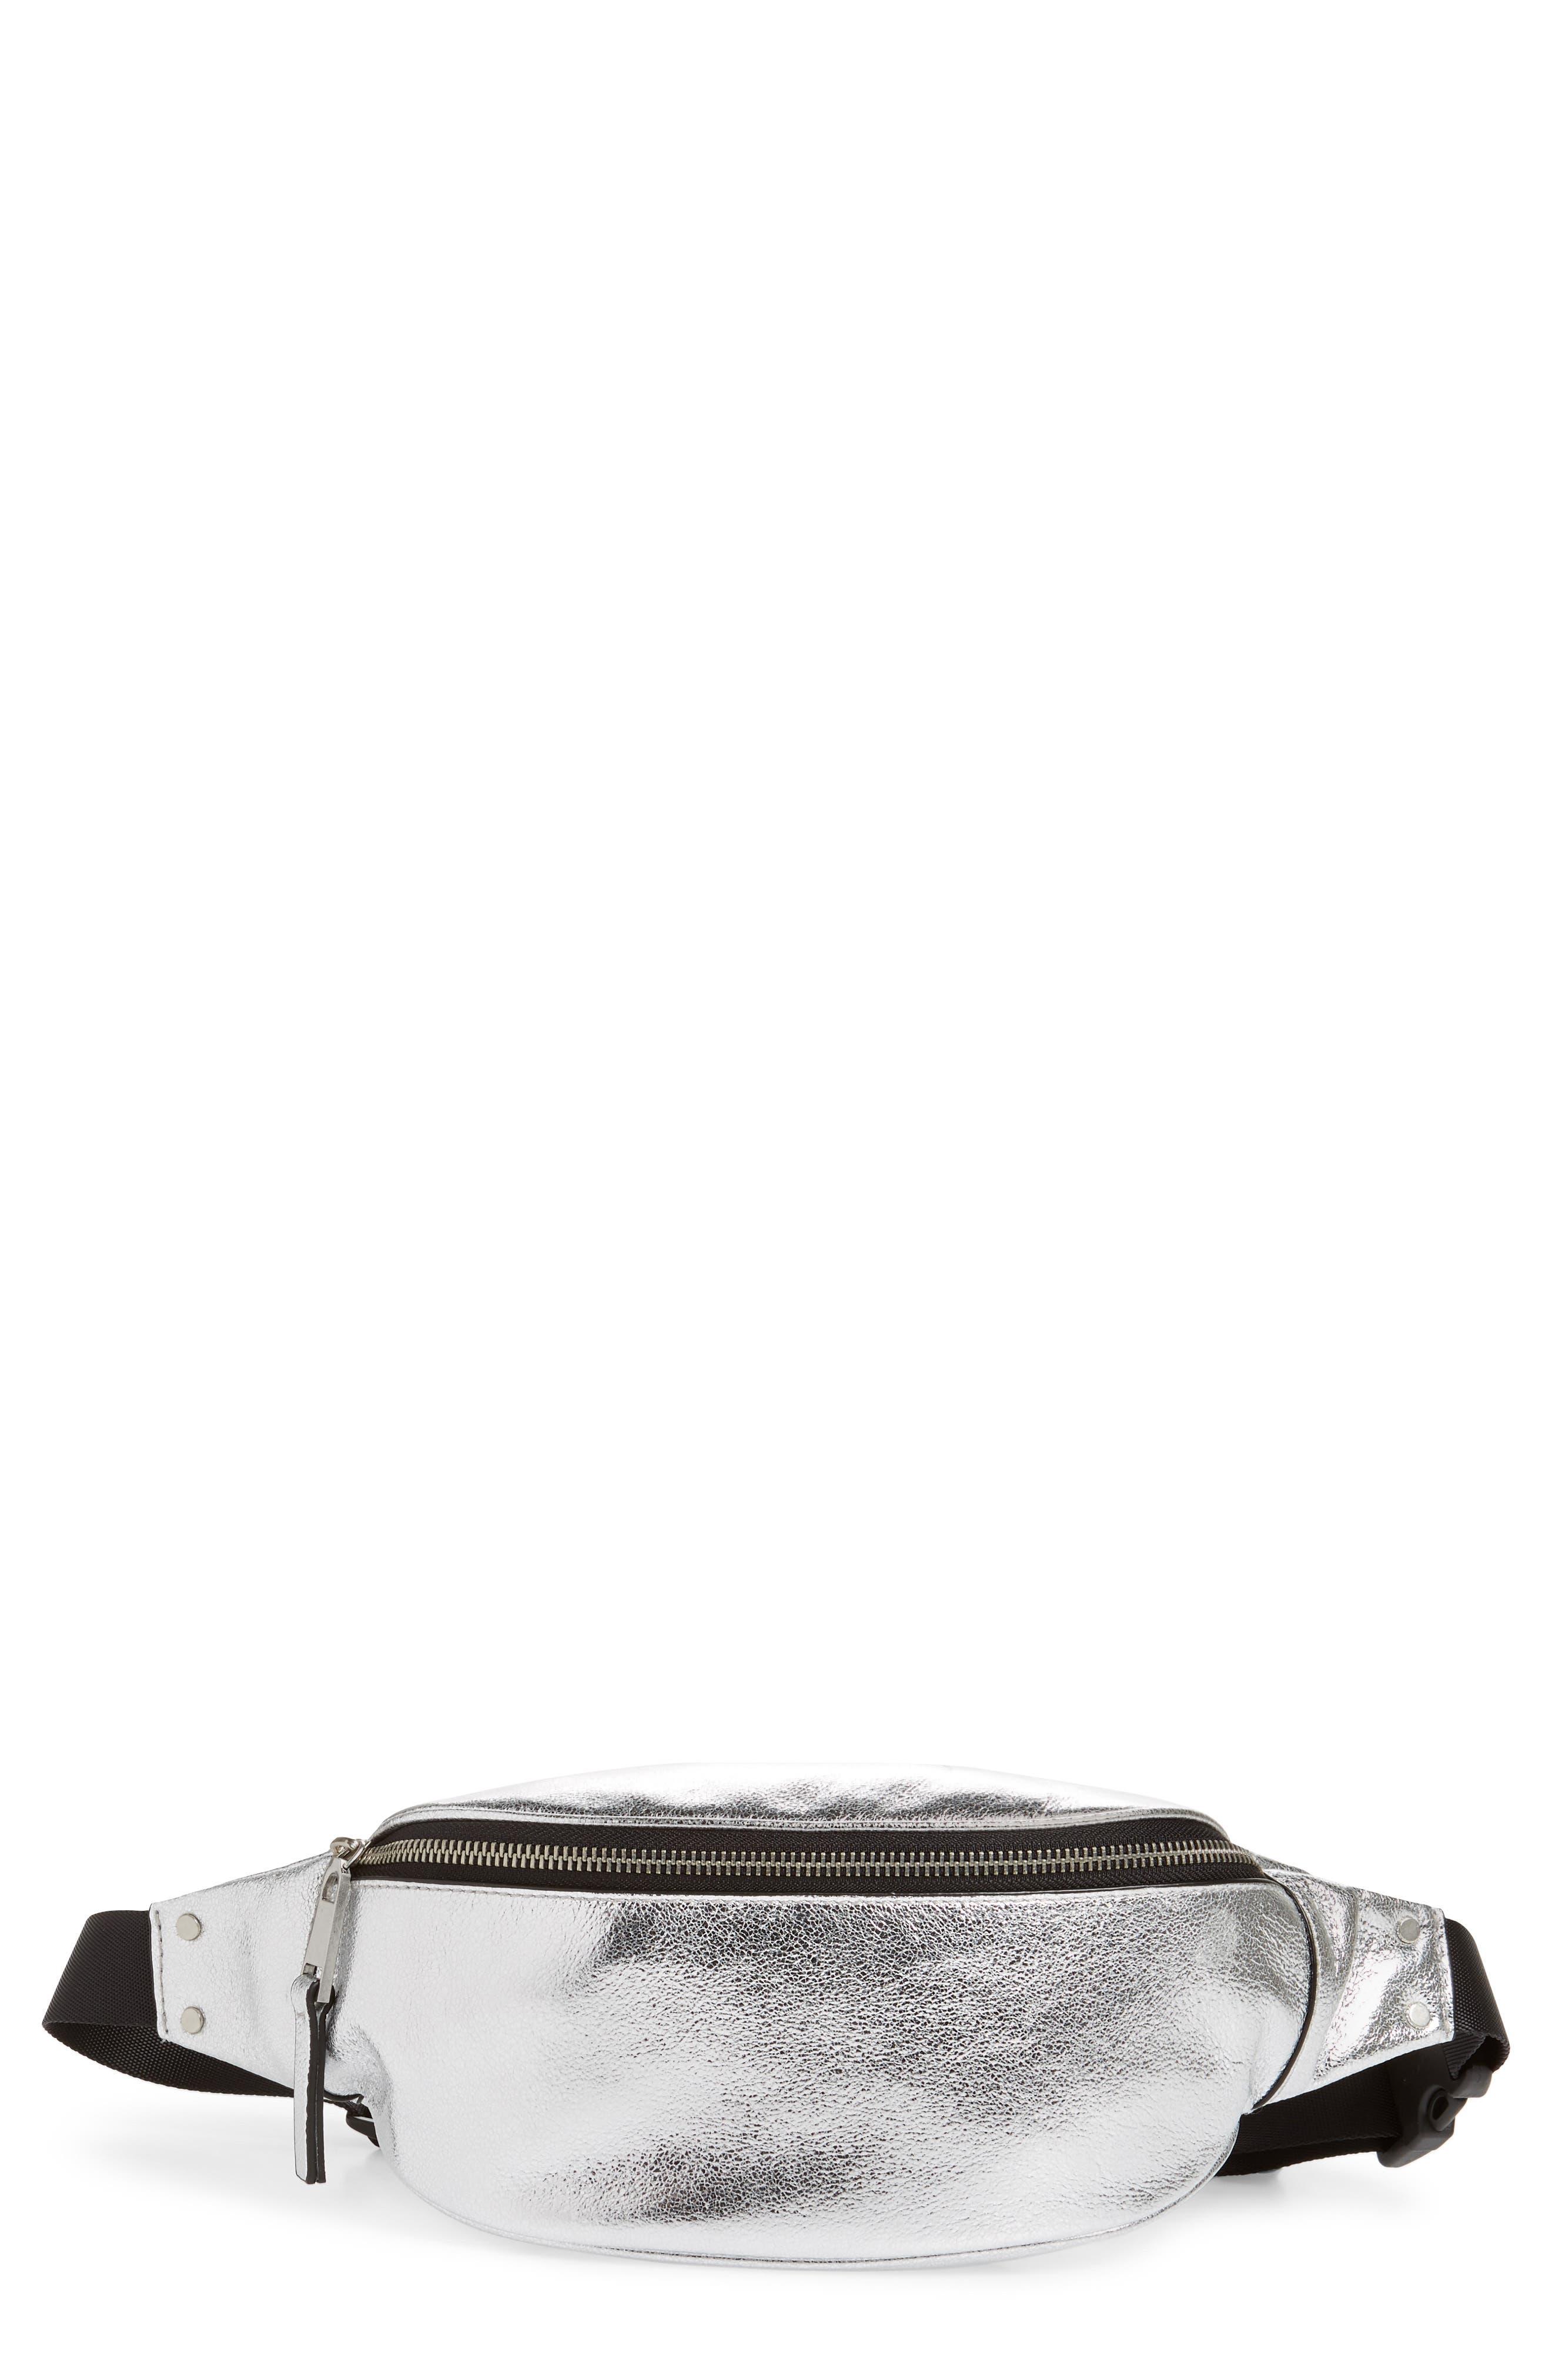 TREASURE & BOND,                             Mason Metallic Leather Belt Bag,                             Main thumbnail 1, color,                             SILVER